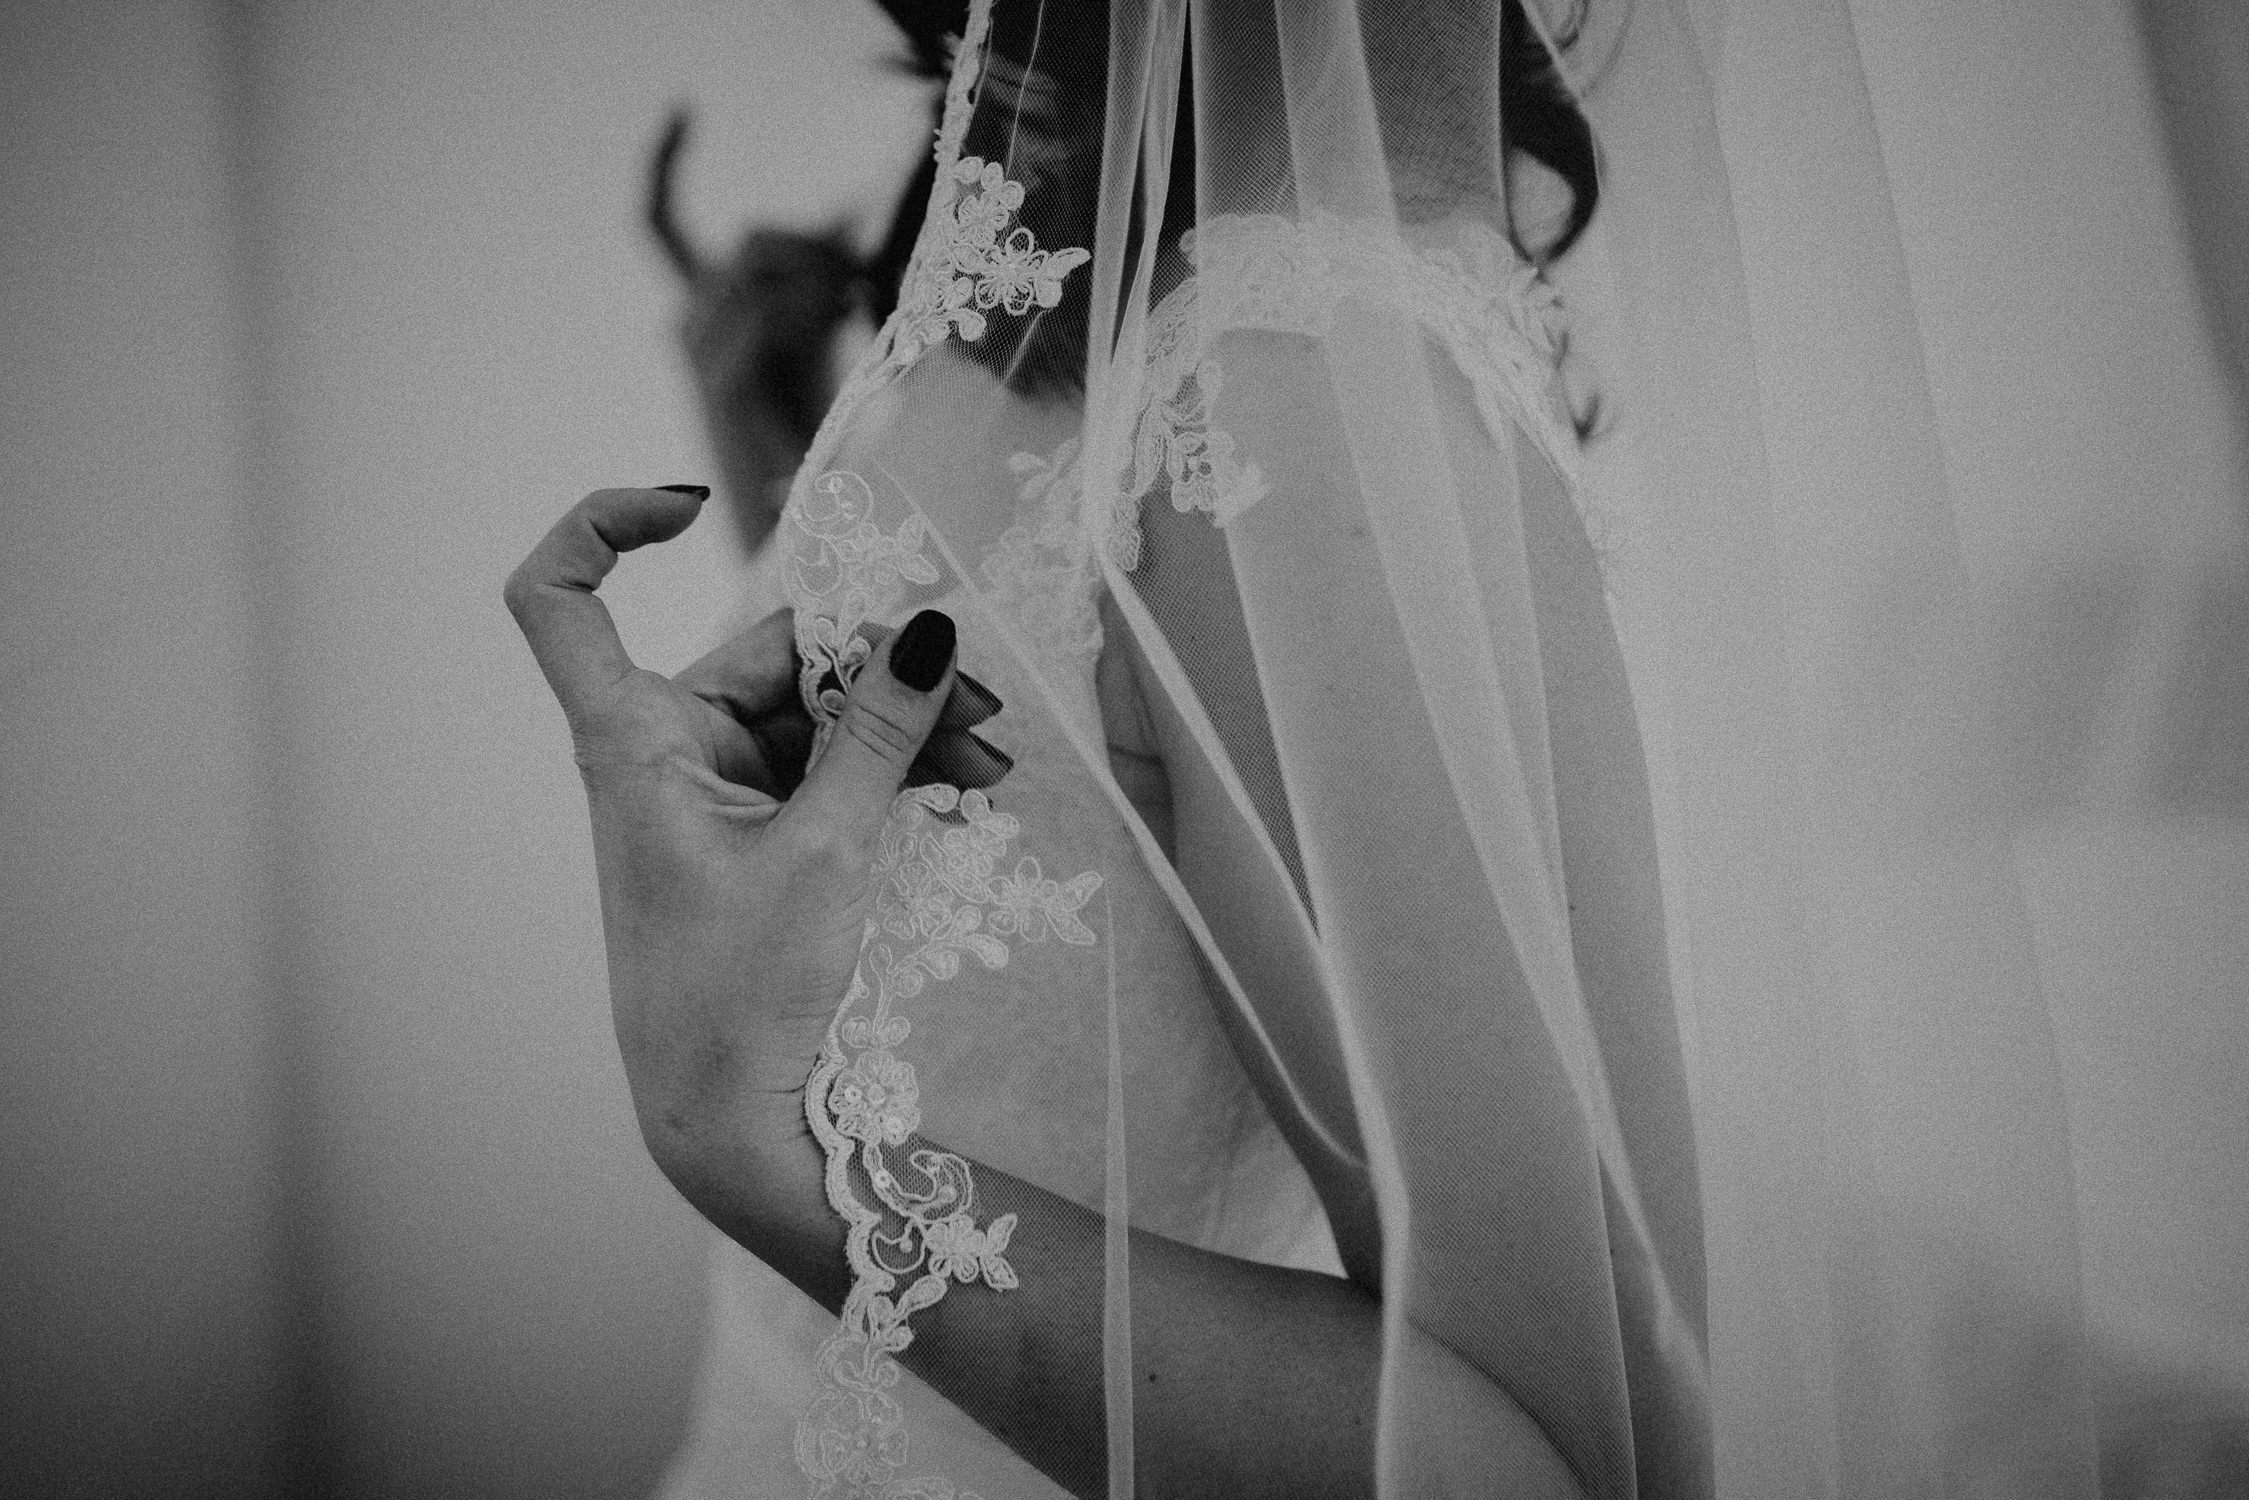 bruidsfotografie-amsterdam-utrecht-trouwfotograaf-mark-hadden-wedding-photography-dado-dalila-041.jpg